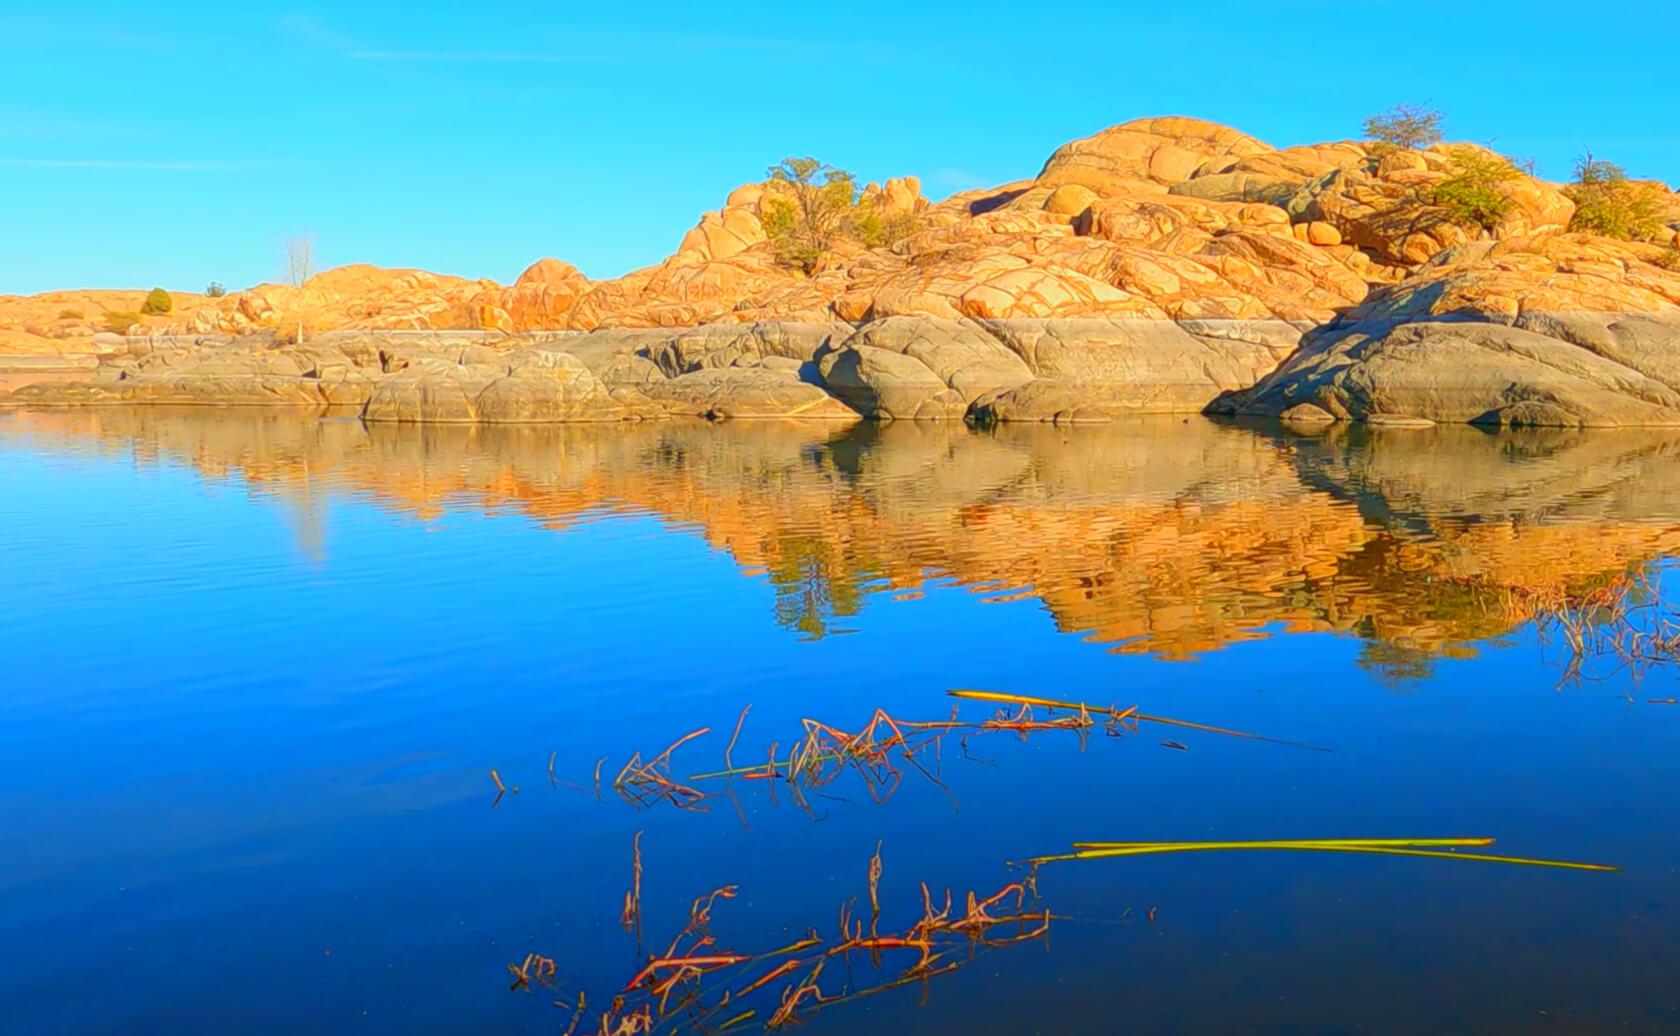 Willow-Lake-Fishing-Guide-Report-Arizona-02